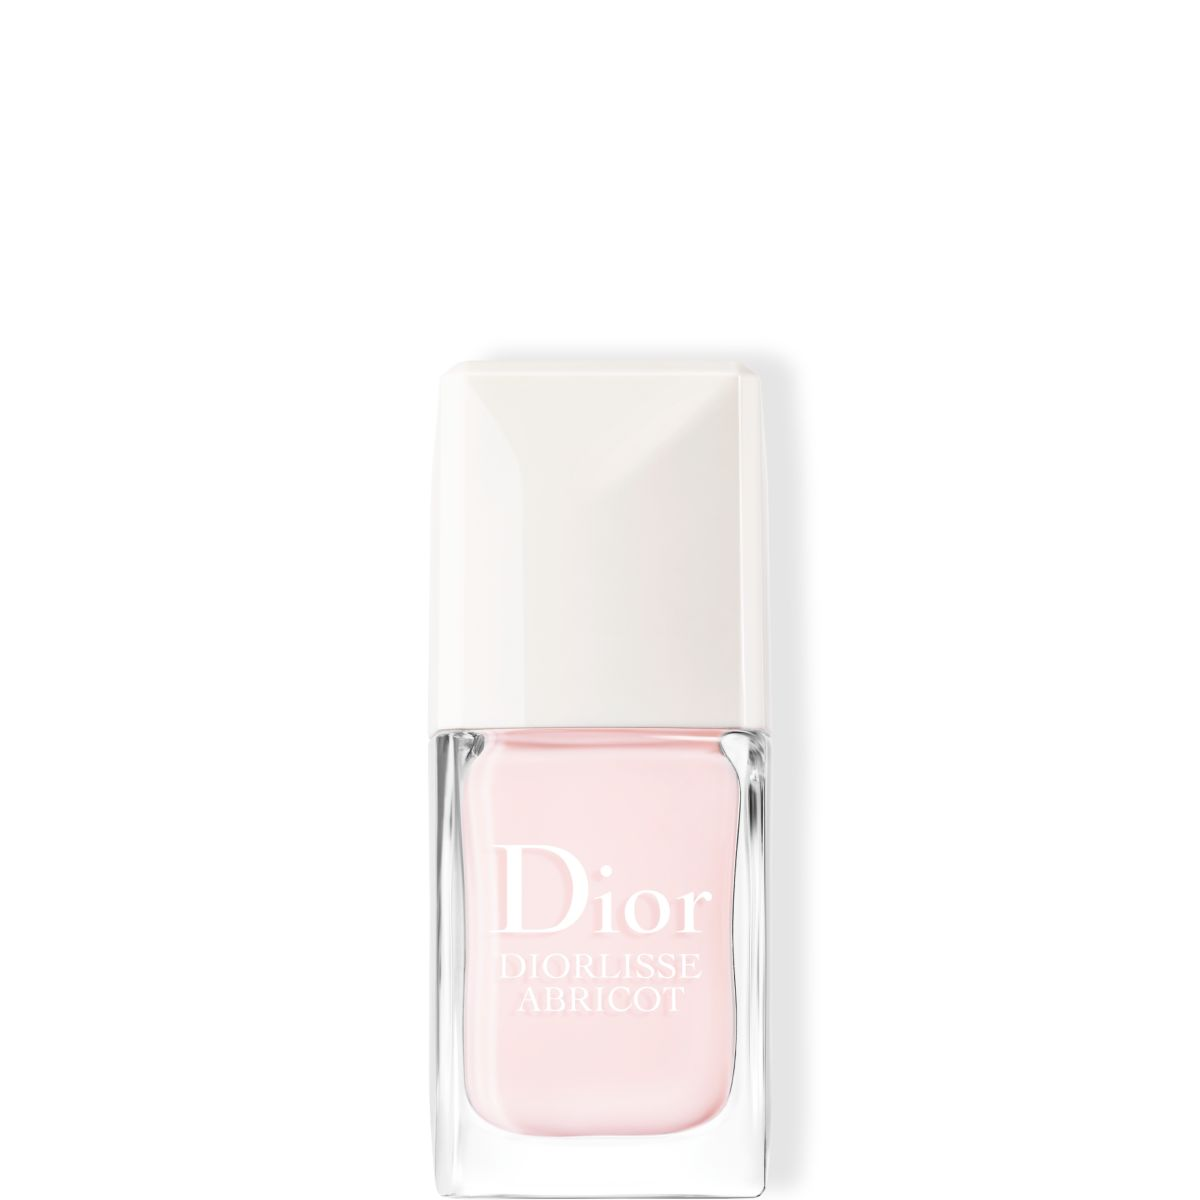 Dior - Dior Lisse - Vernis soin lissant perfecteur